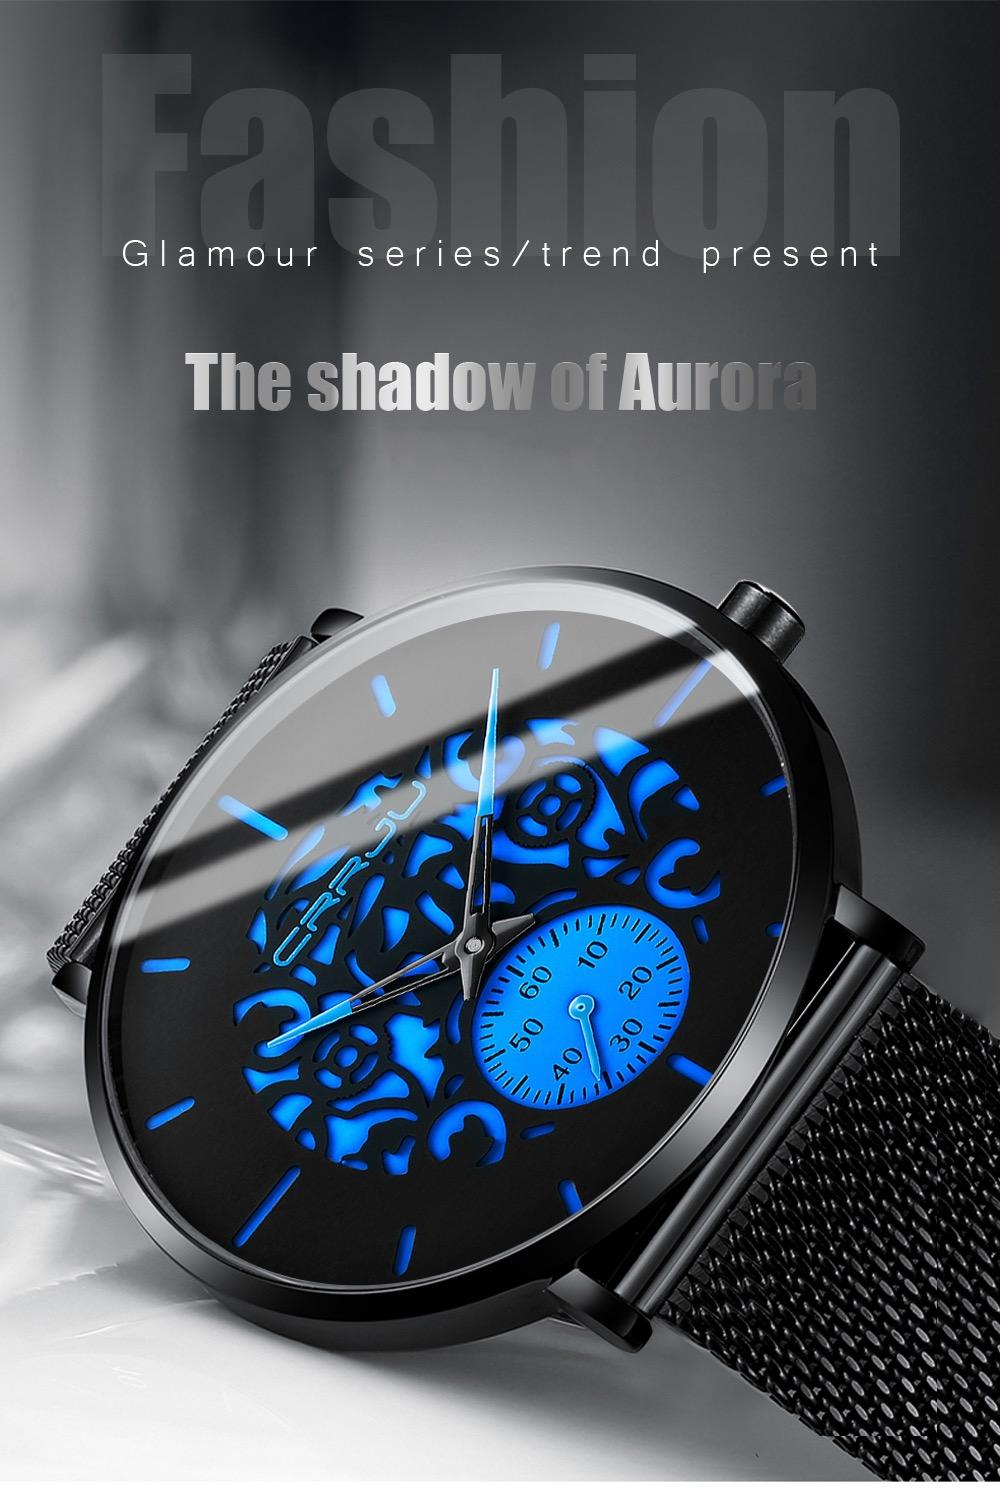 CRRJU Ultra-thin Mesh Strap Watch for Men Quartz Watch Fashion Men's Blue WristWatch at SenseOrient